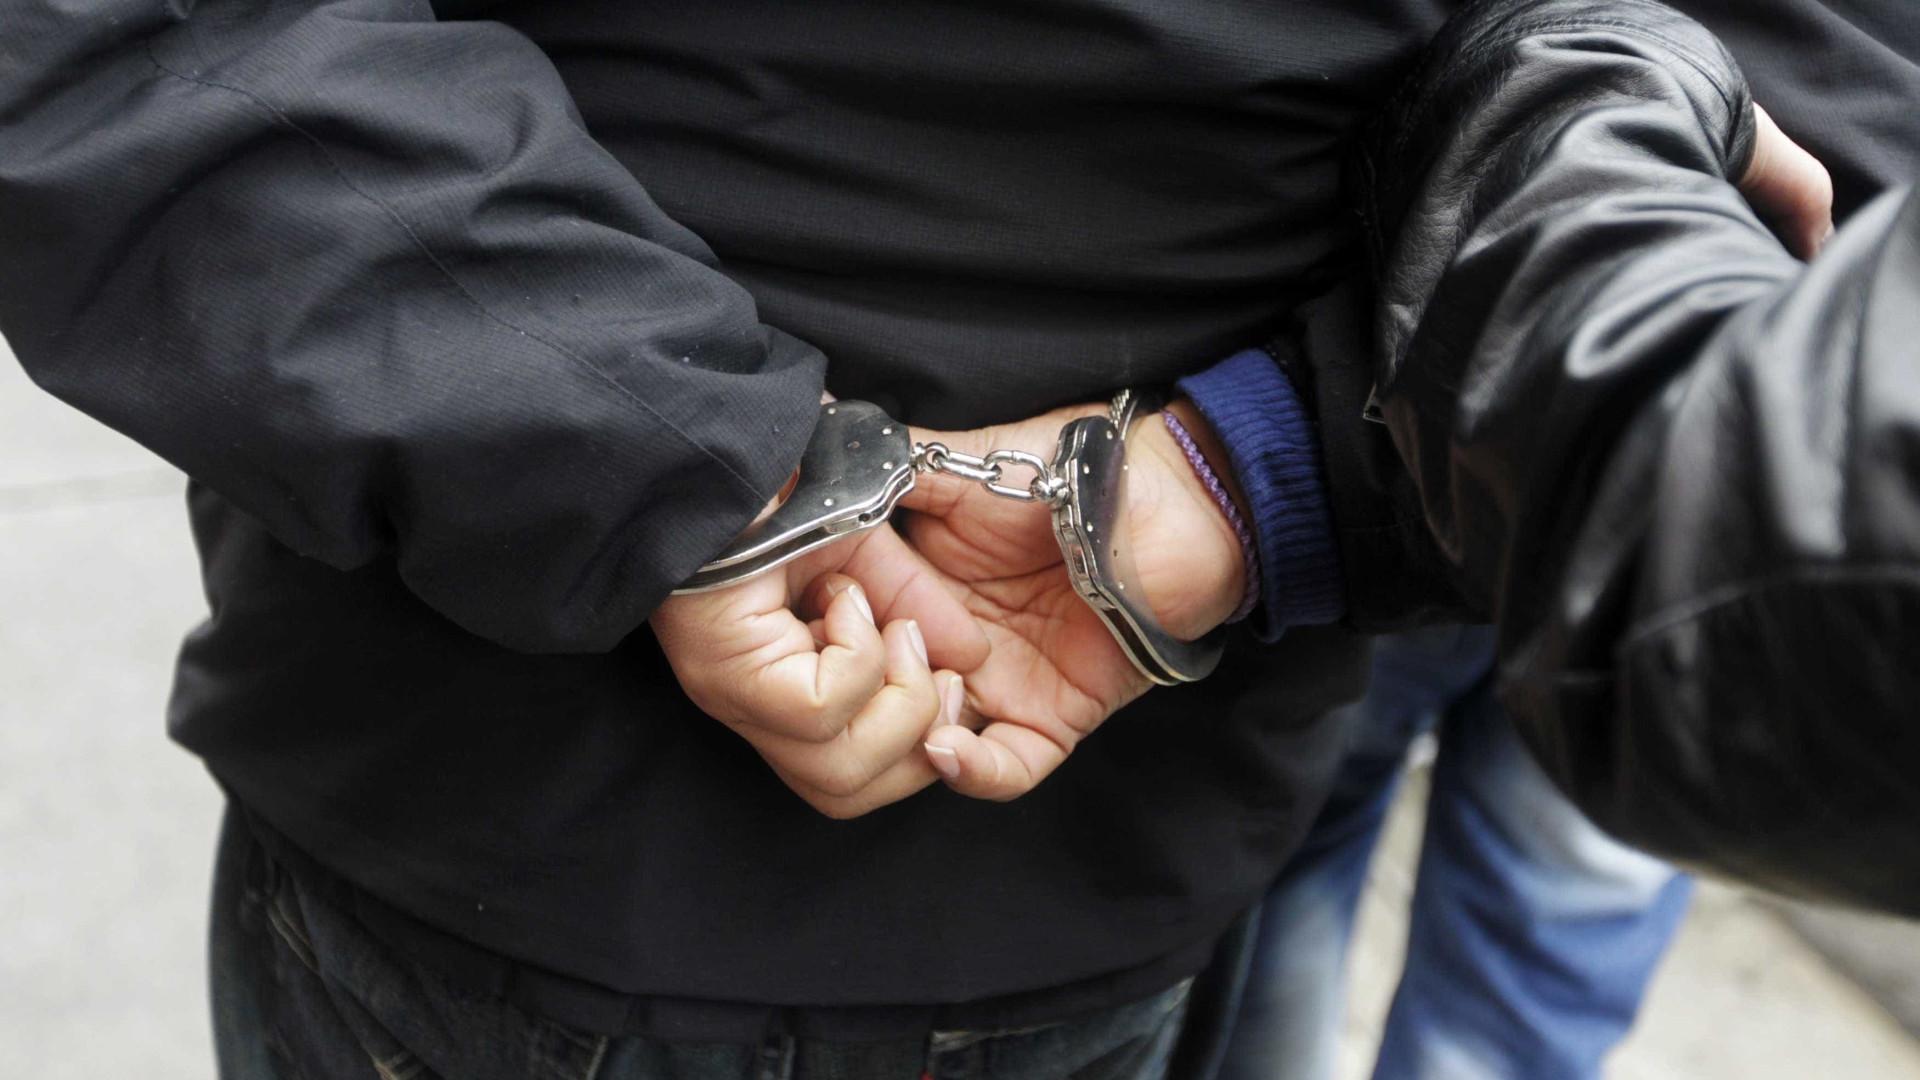 Polícia prende suspeito de estupro coletivo de menina de 12 anos